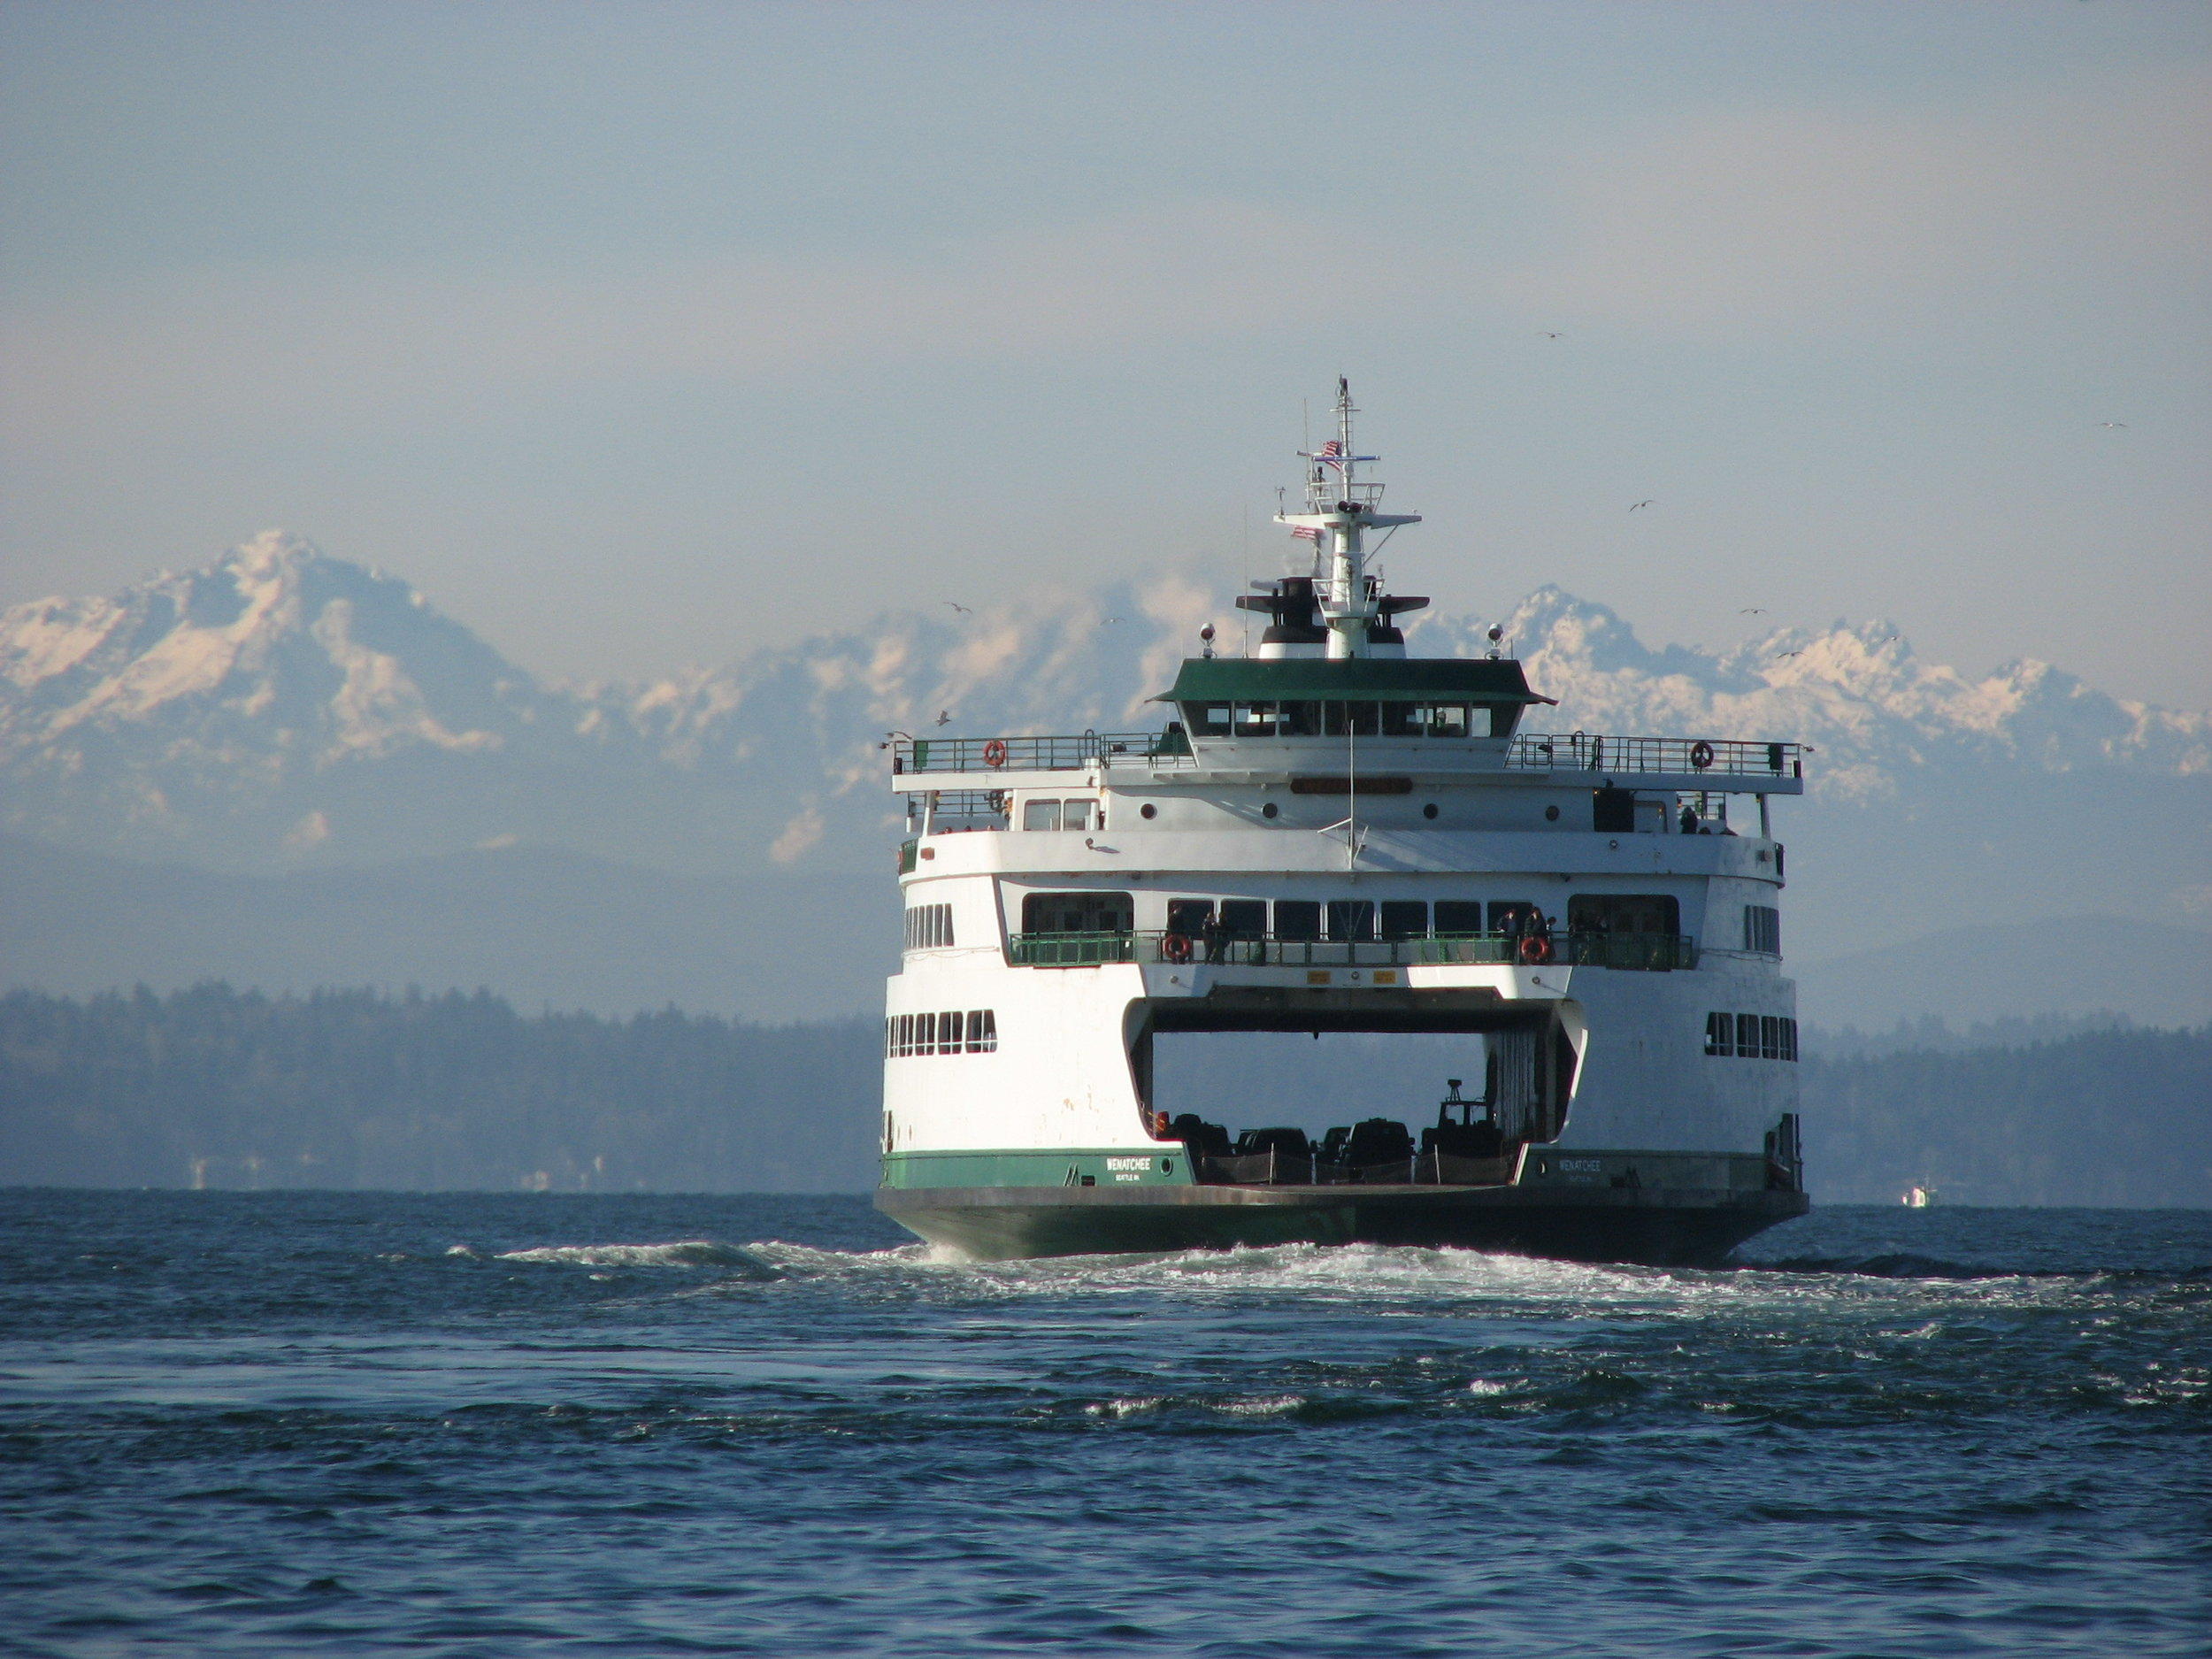 Ferry_Wenatchee_enroute_to_Bainbridge_Island_WA.jpg